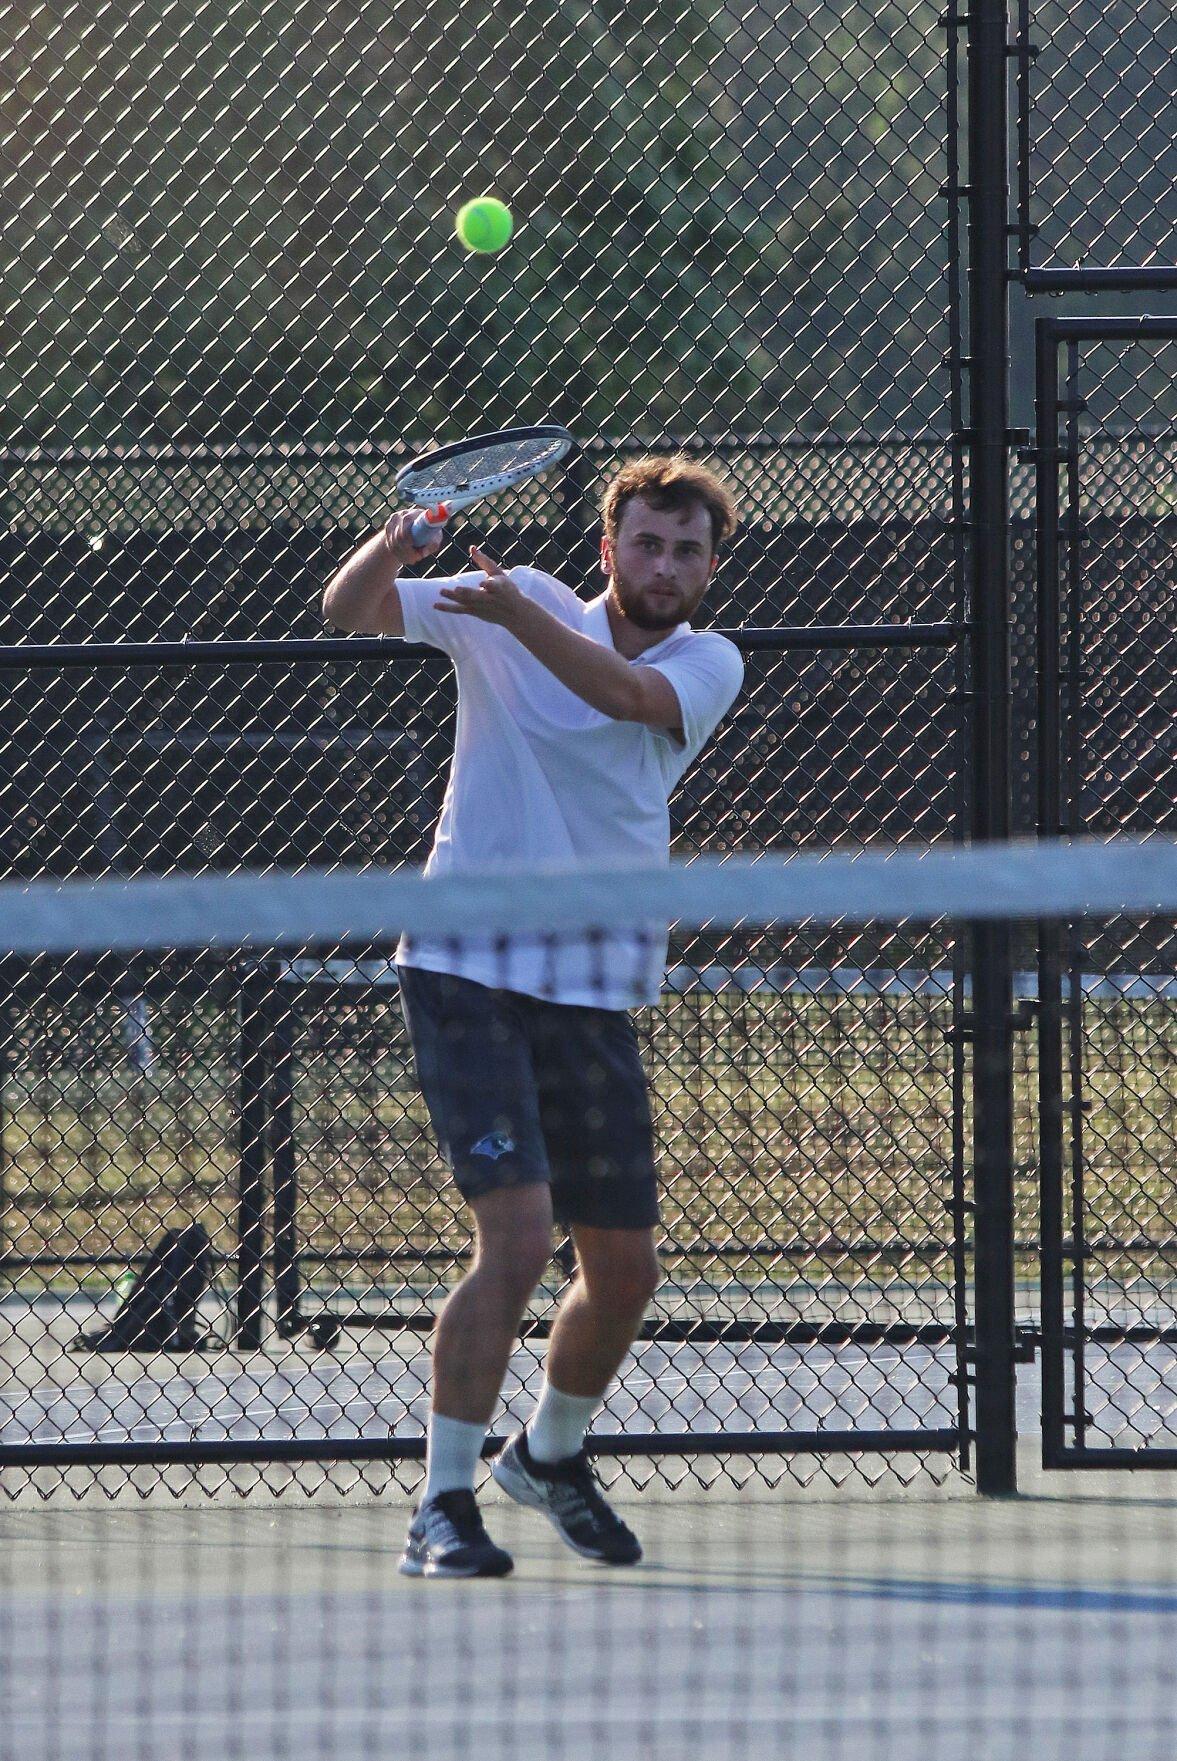 Region 4B boys tennis semifinal: Charles Adams